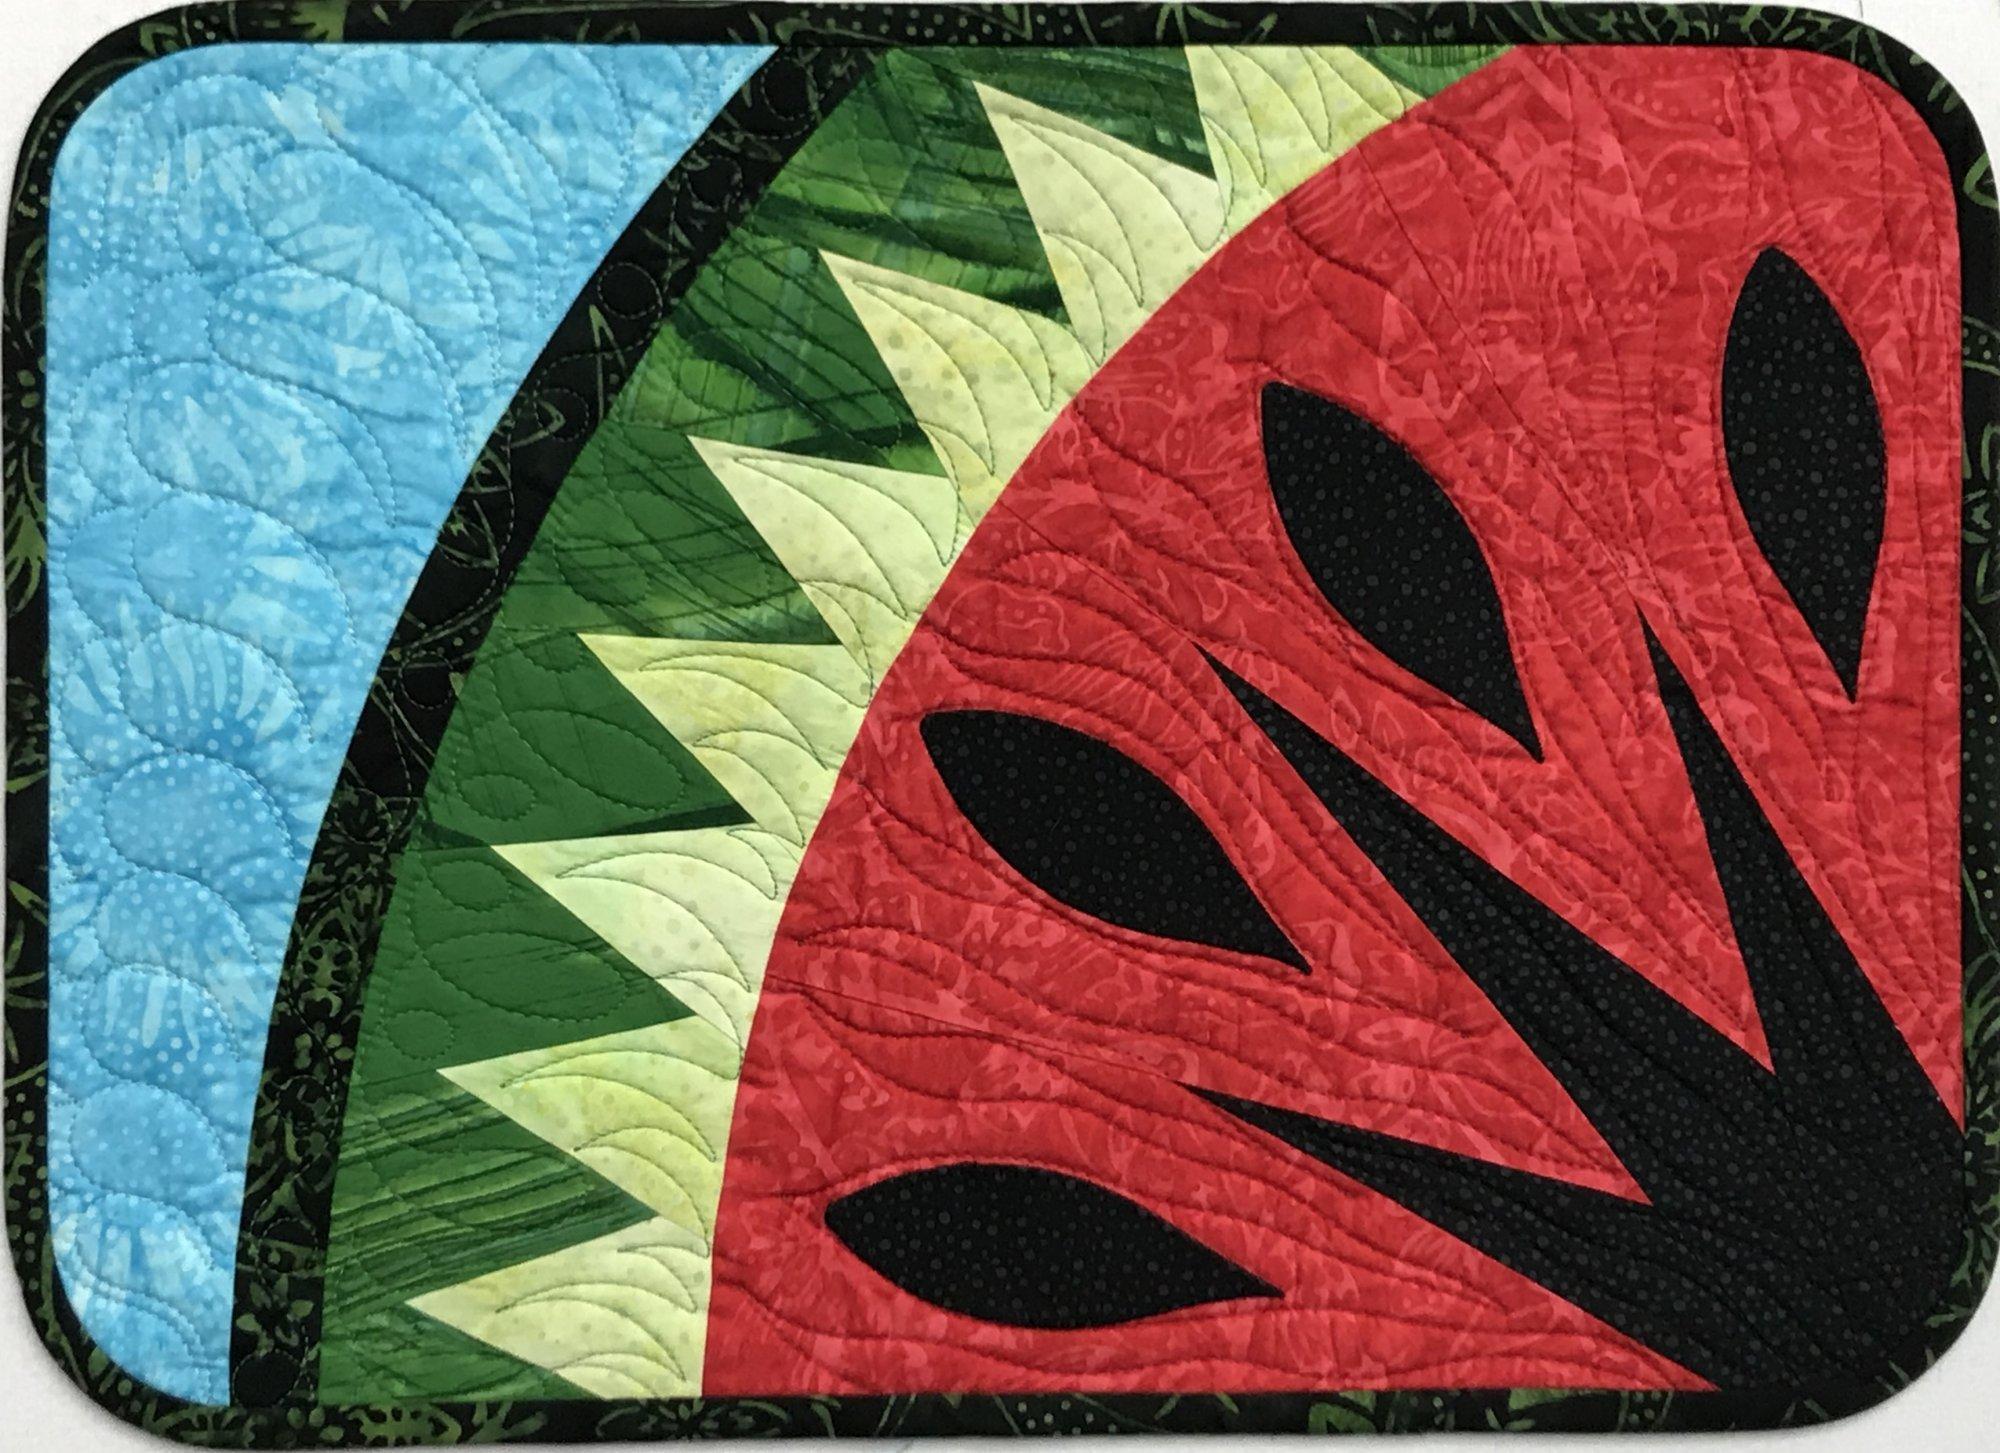 Watermelon Placemats Kits-Multiple Color ways